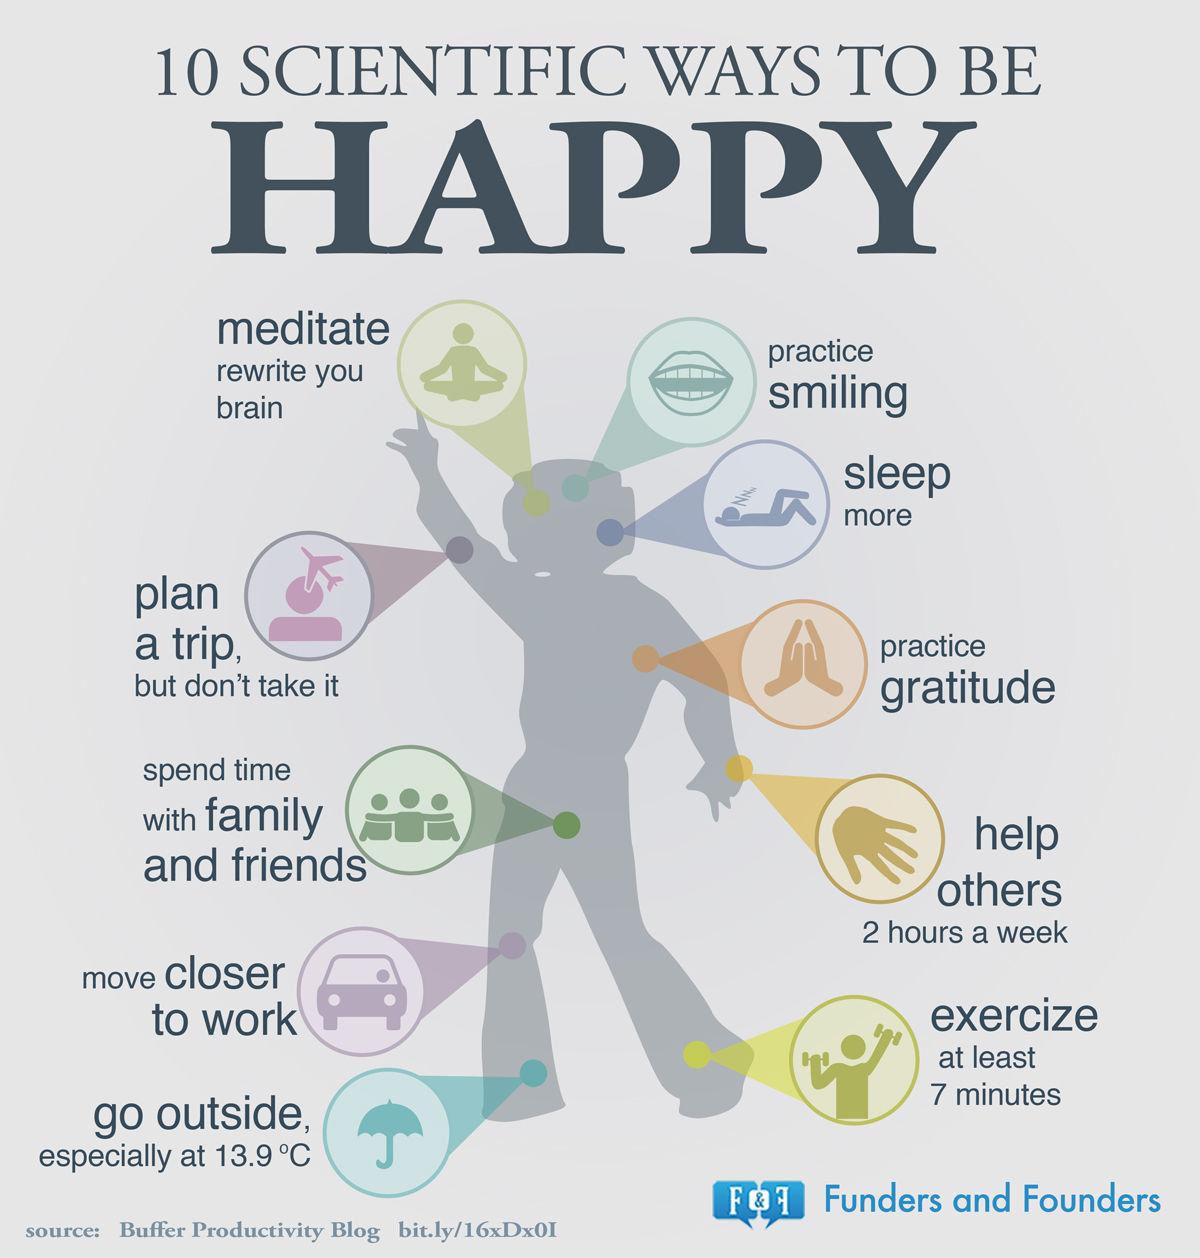 10 Cara simpel & ilmiah ini bikin kamu cepat raih kebahagiaan hidup!